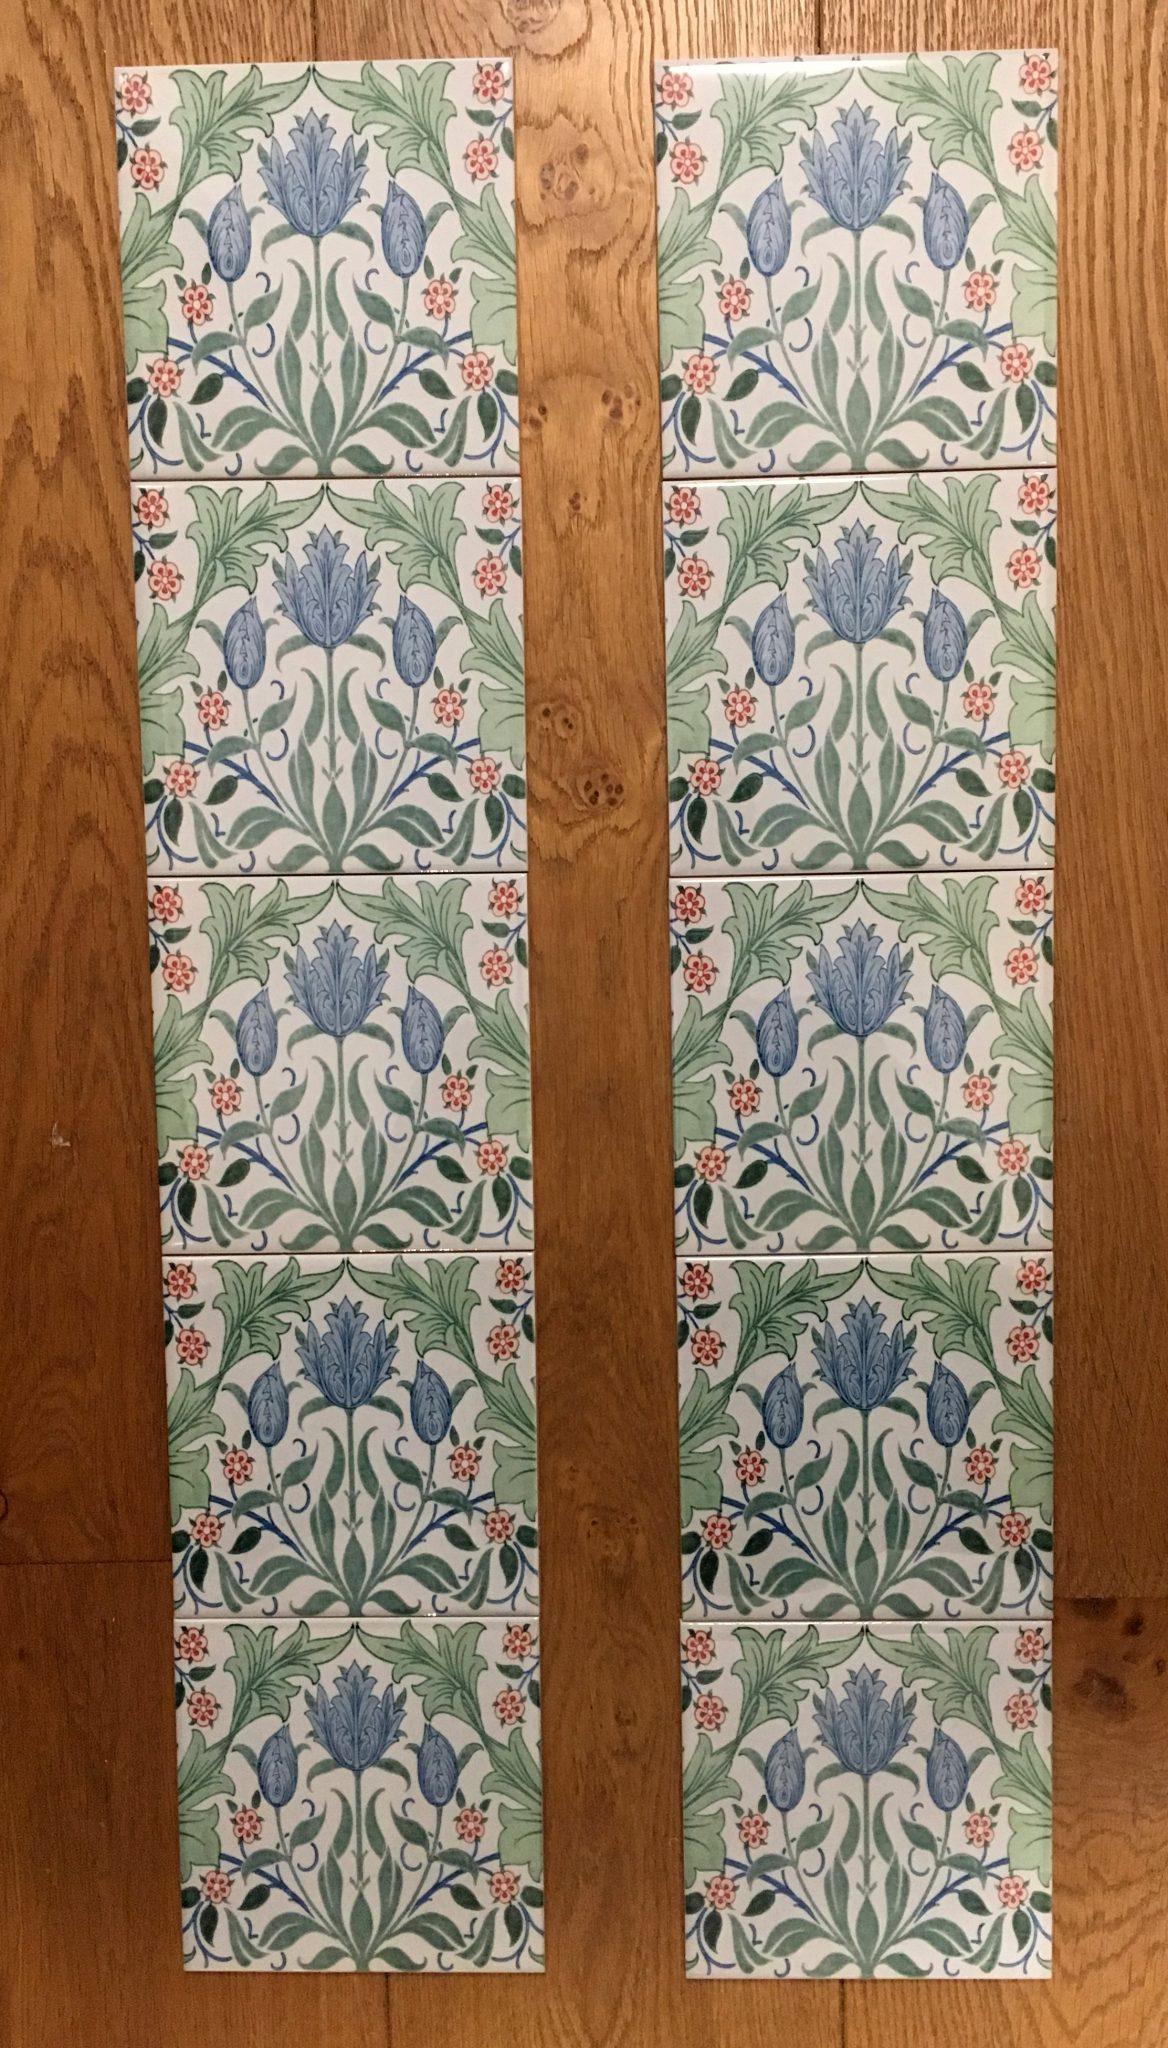 William Morris Tulip 2 Fireplace Tile Set